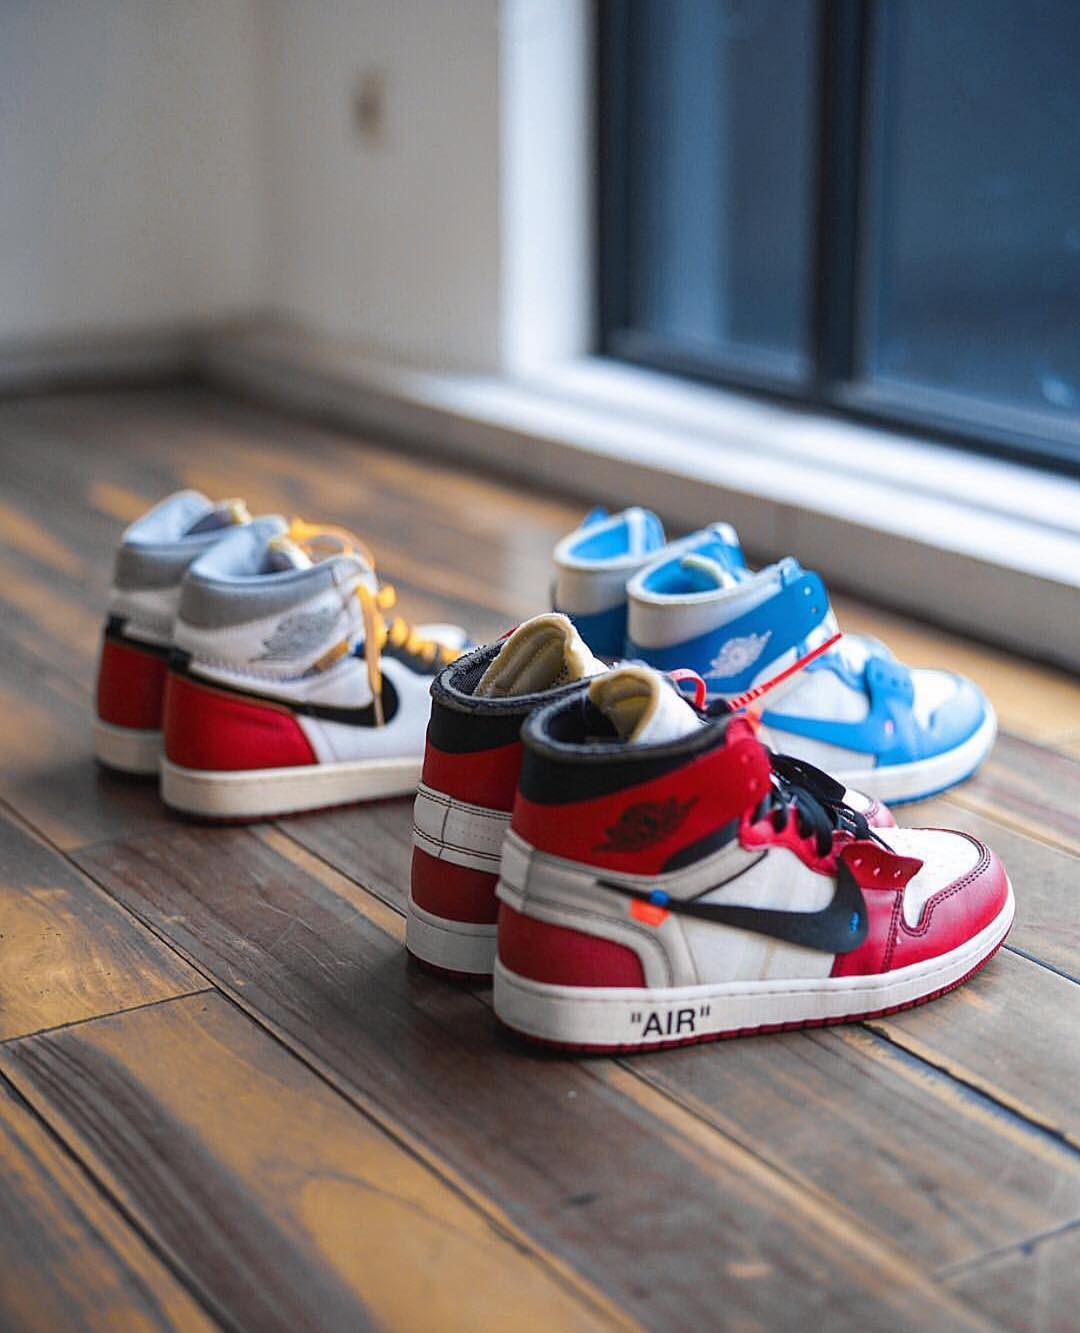 Air Jordan 1,Yeezy,发售,VaporFly  反钩、刮刮乐过时了!最新版「球鞋外号」,知道一半就算大神!